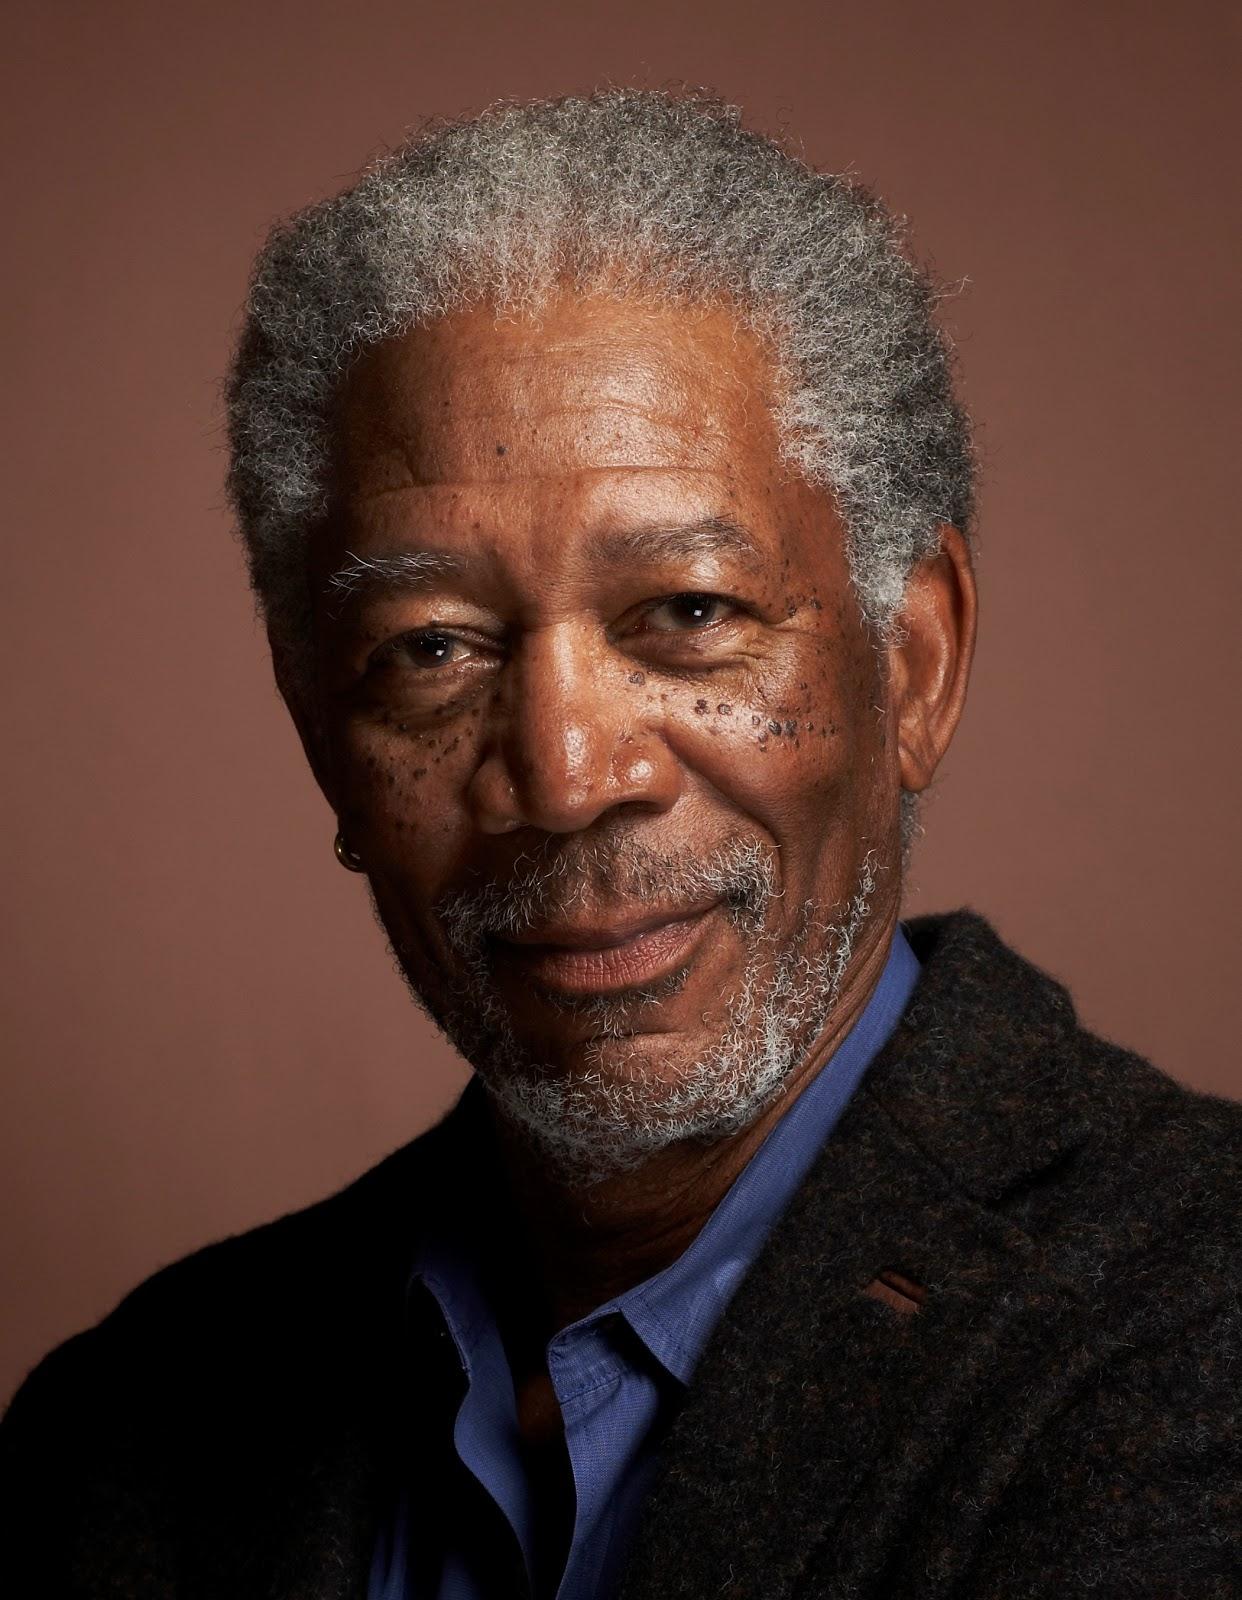 Morgan Freeman Wallpapers